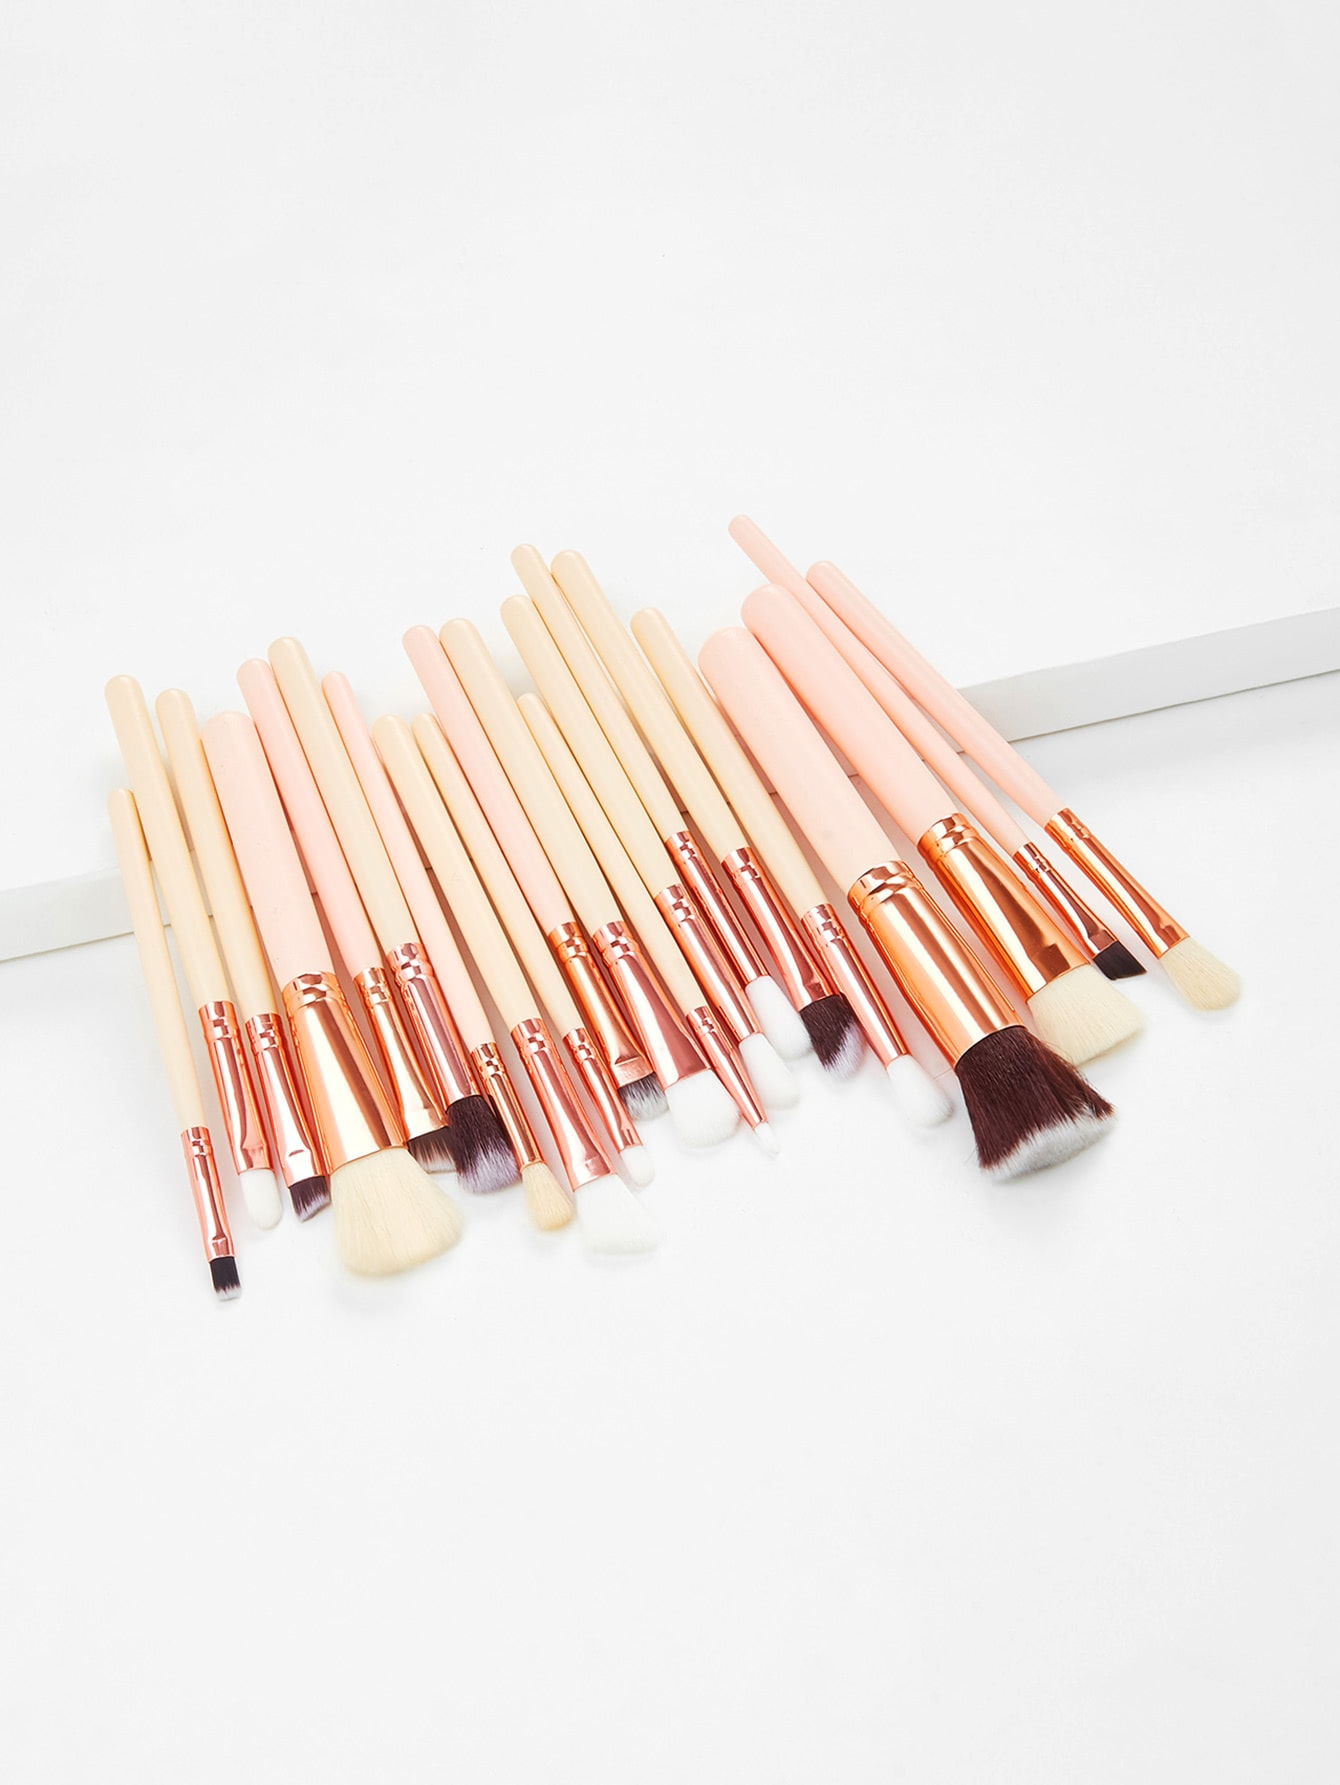 Professional Makeup Brush 20pcs 20pcs strw6554a strw6554 w6554a